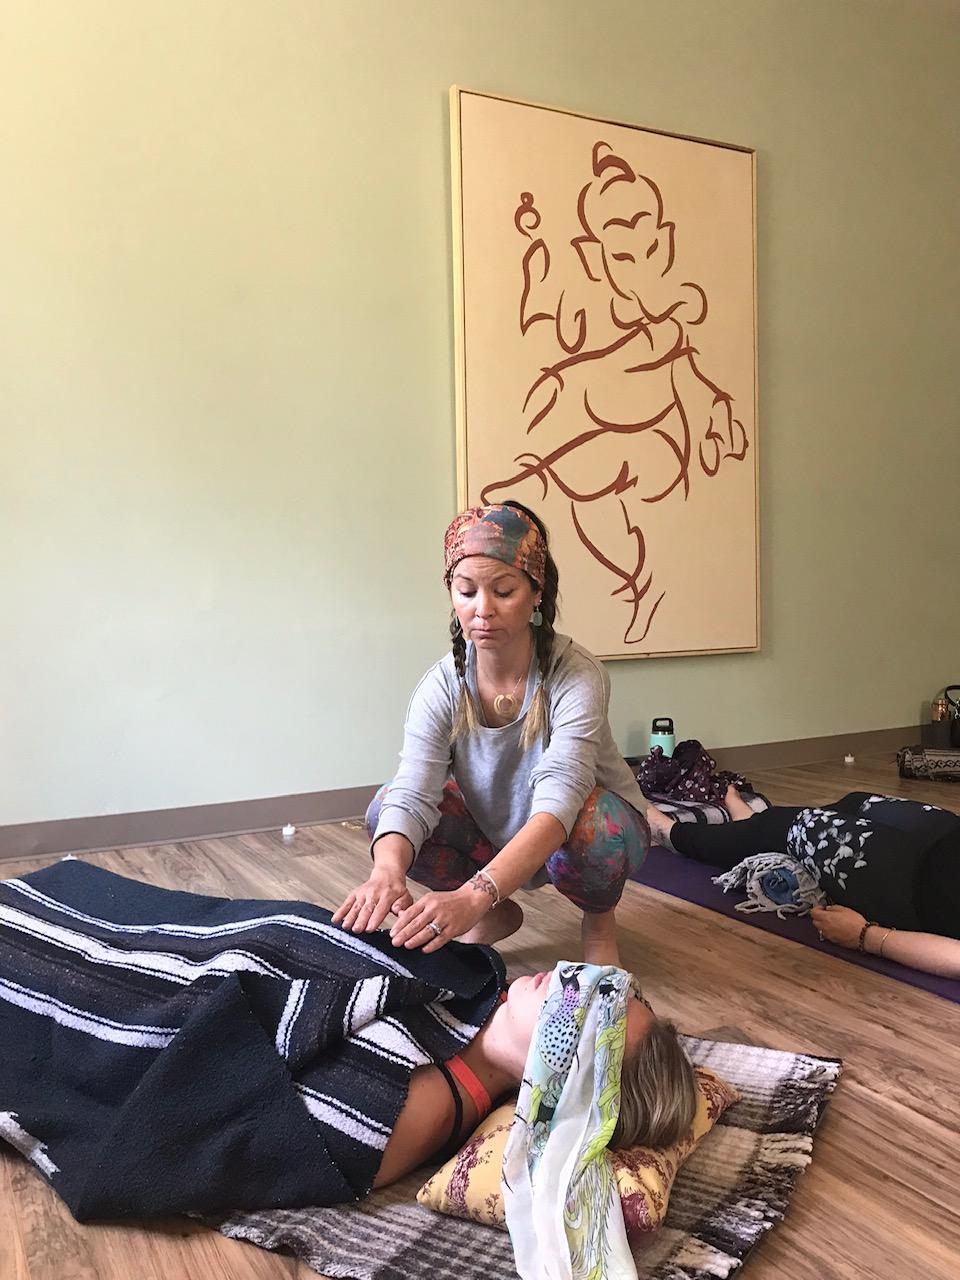 Healing Arts with Zoe Archer - Reiki, Shiatsu, Essential Oils